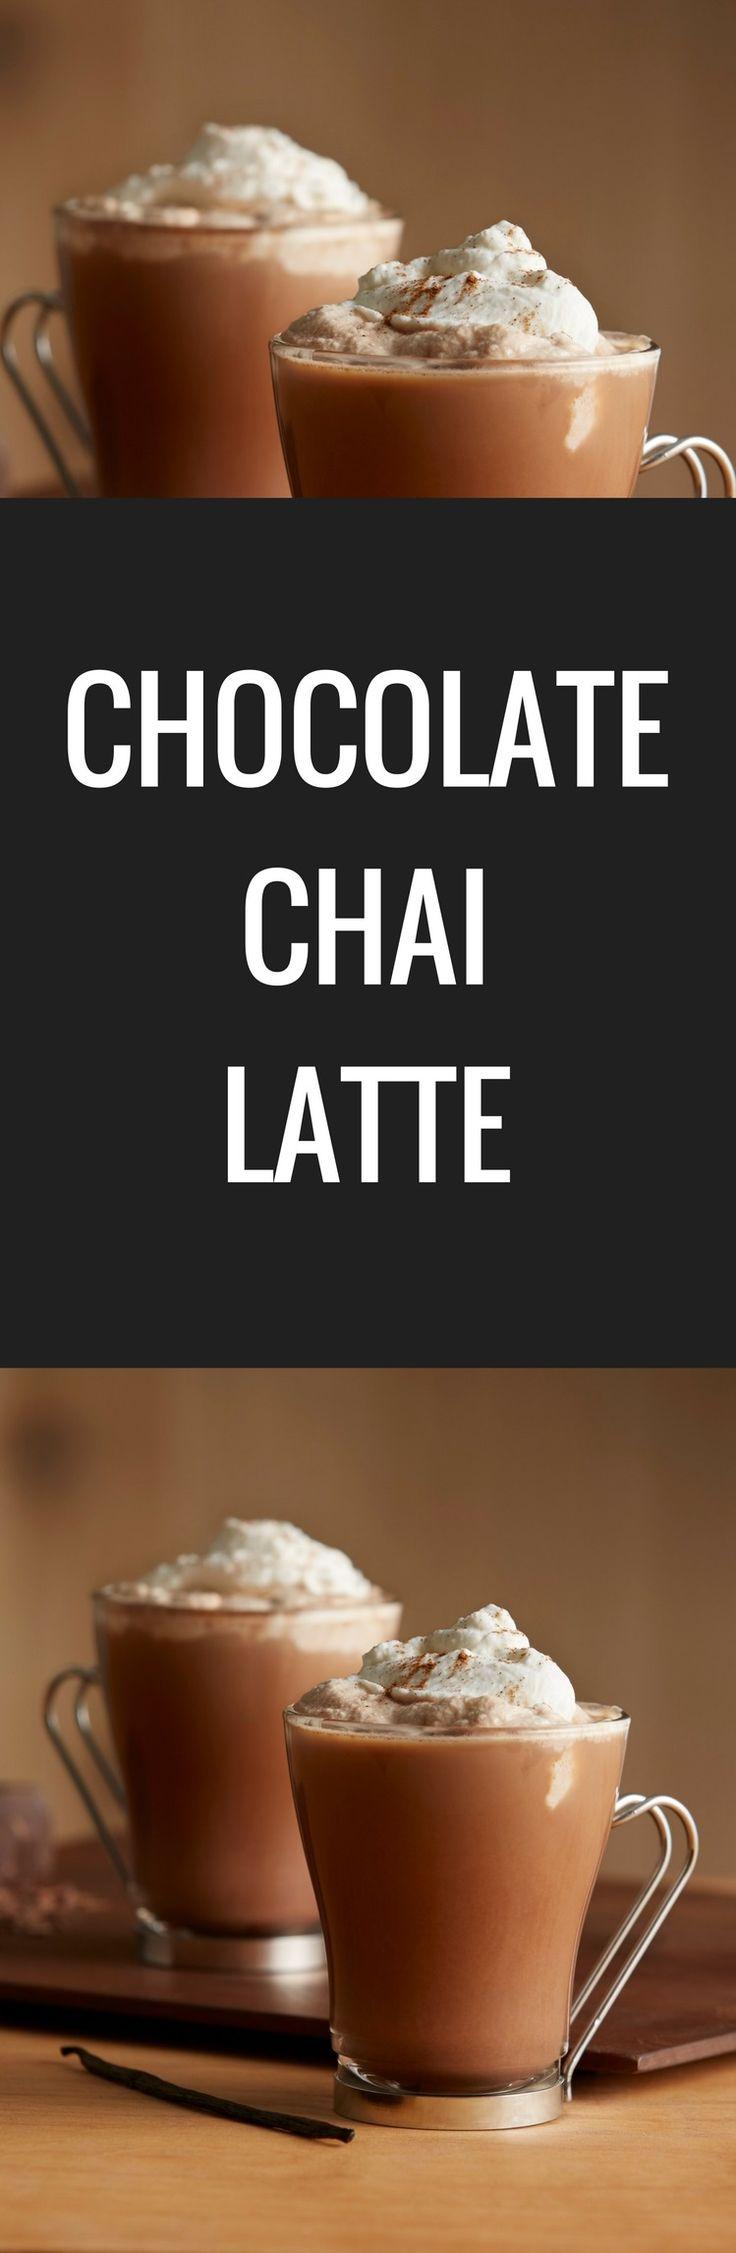 Spiced chai tea, rich chocolate and a dash of vanilla make this Chocolate Chai Latte a new winter favorite.